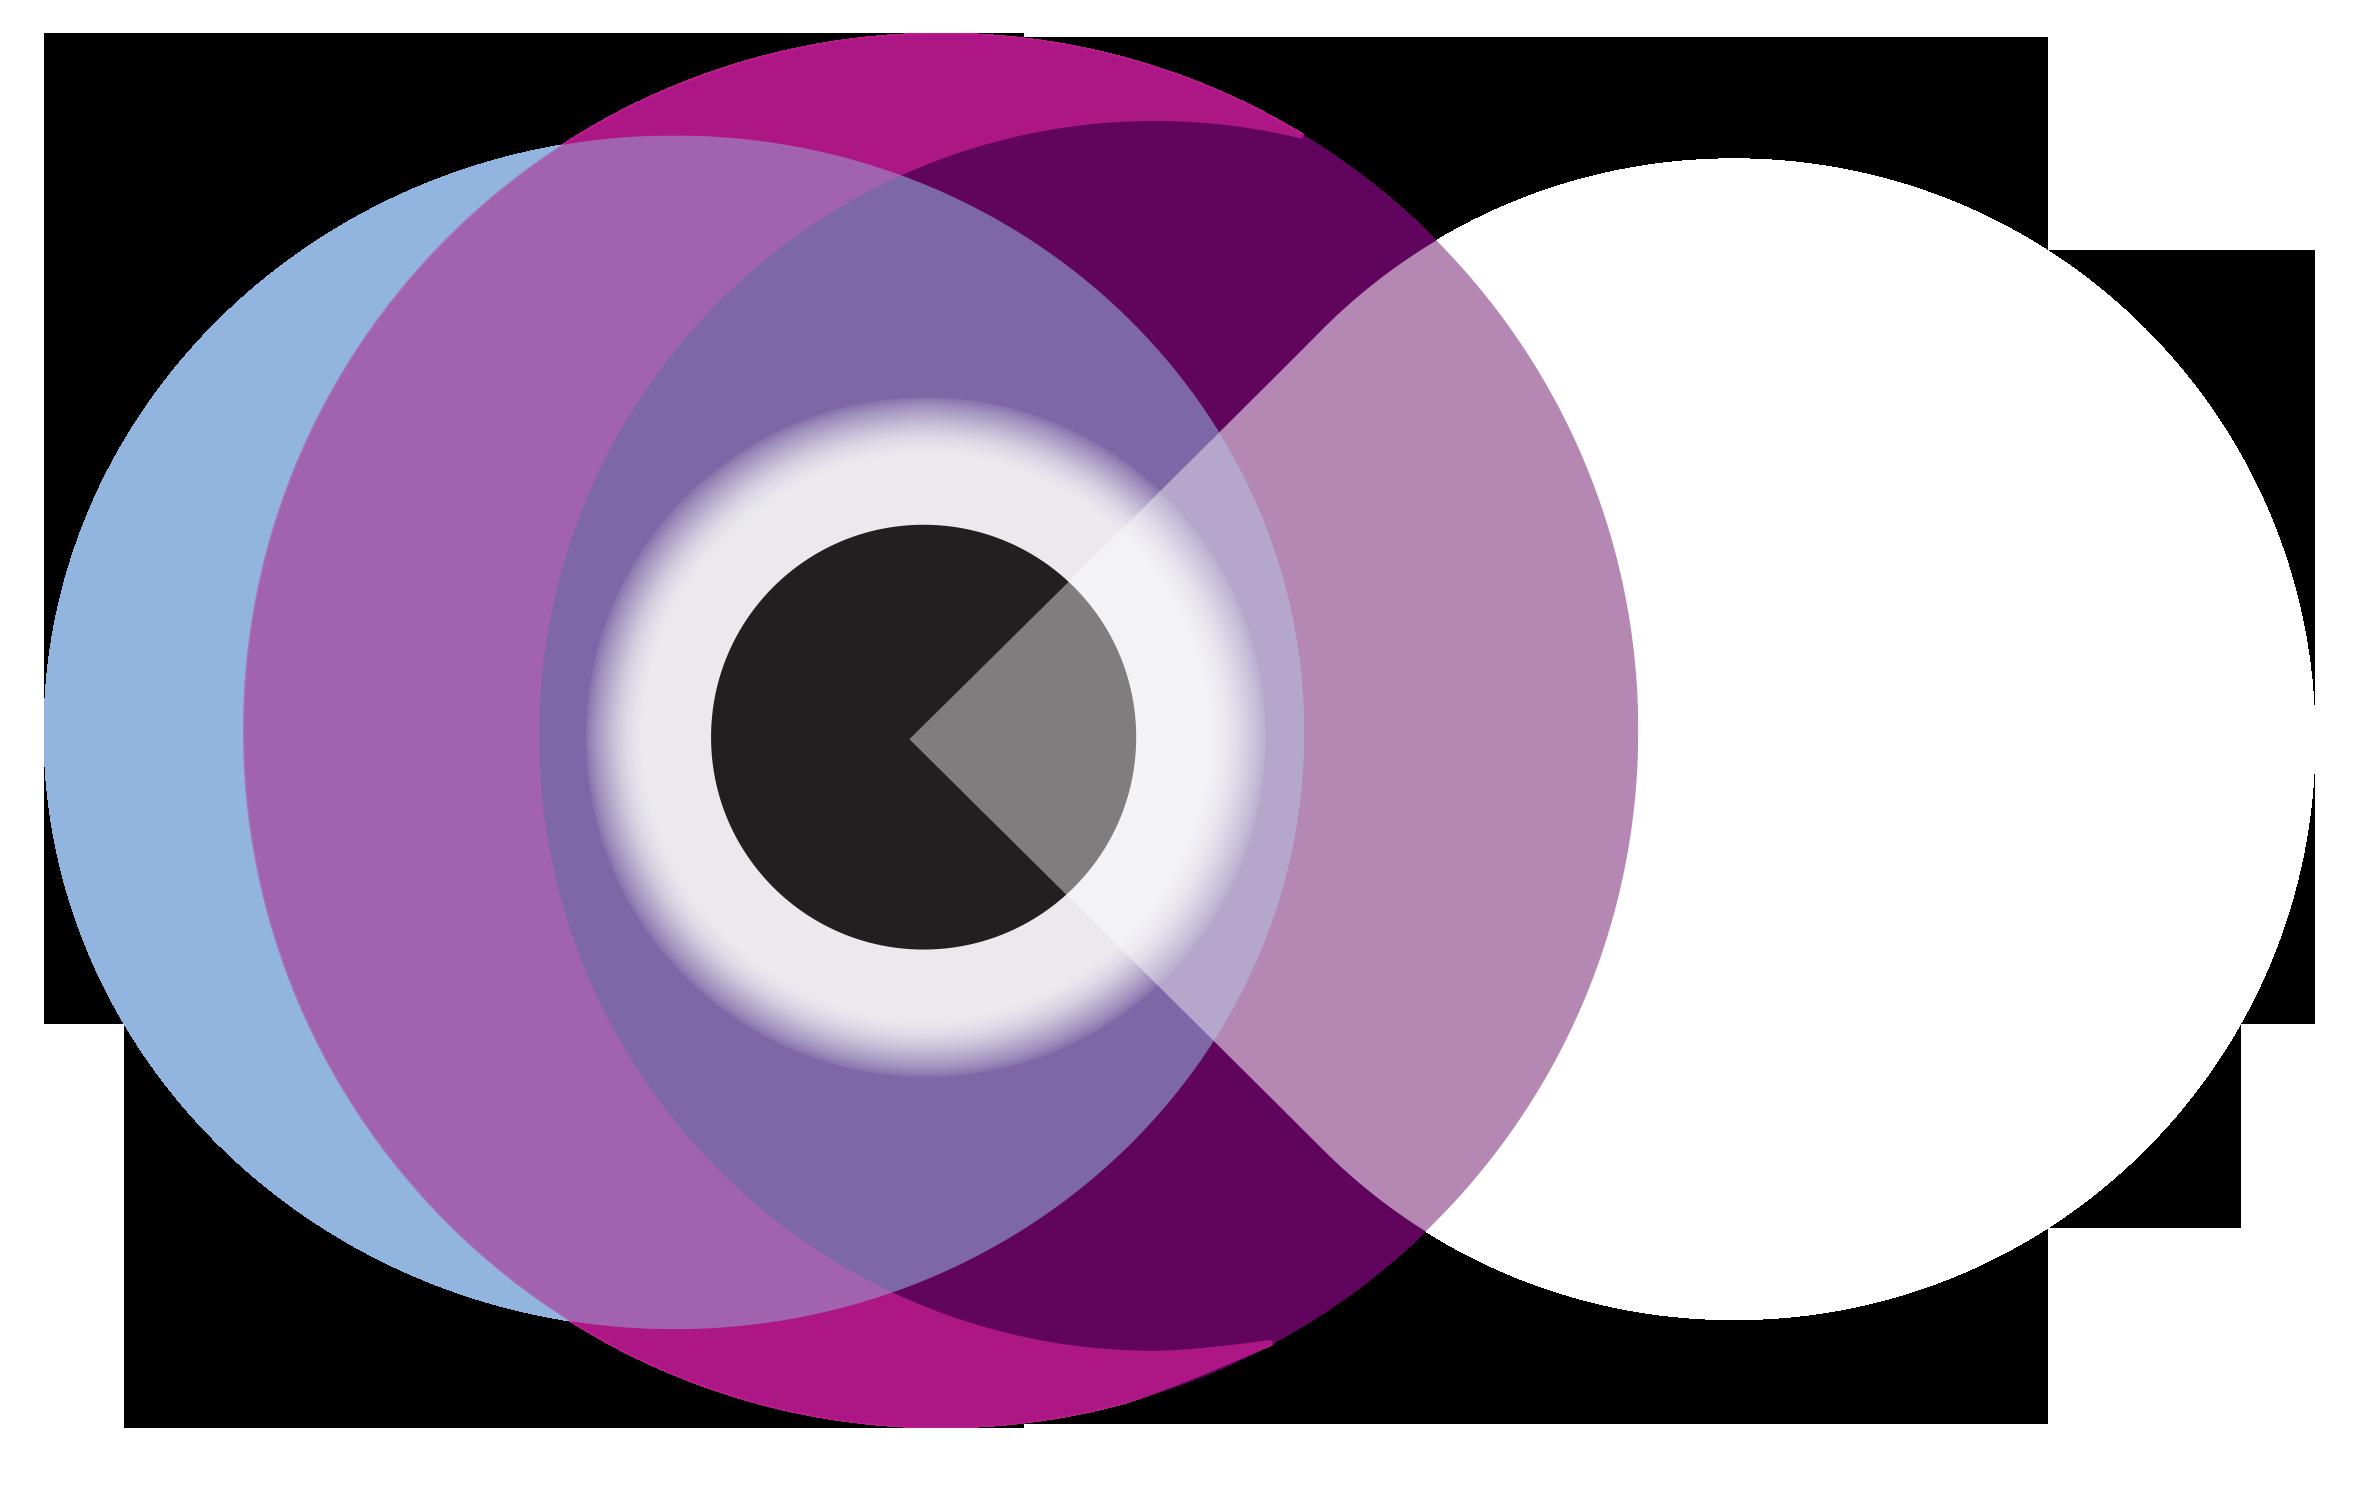 ws-2016-logo-no-background